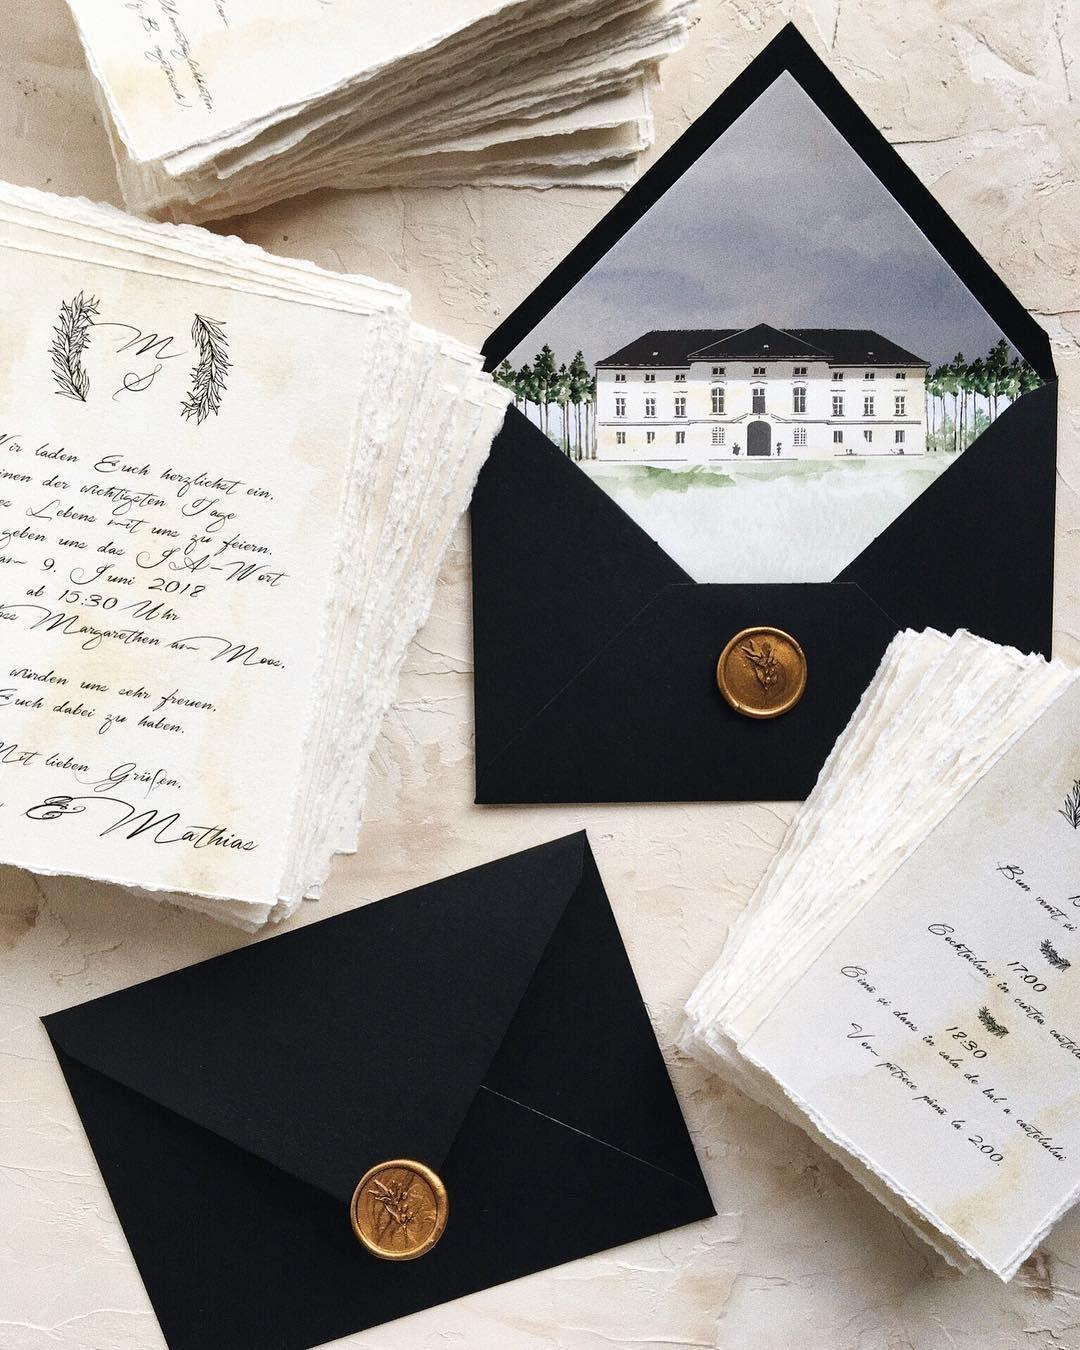 Calligraphy Romantic Wedding Invitation With Custom Envelope Liner Featuring The Watercolor Venue Papira Invitatii De Nunta Personalizate